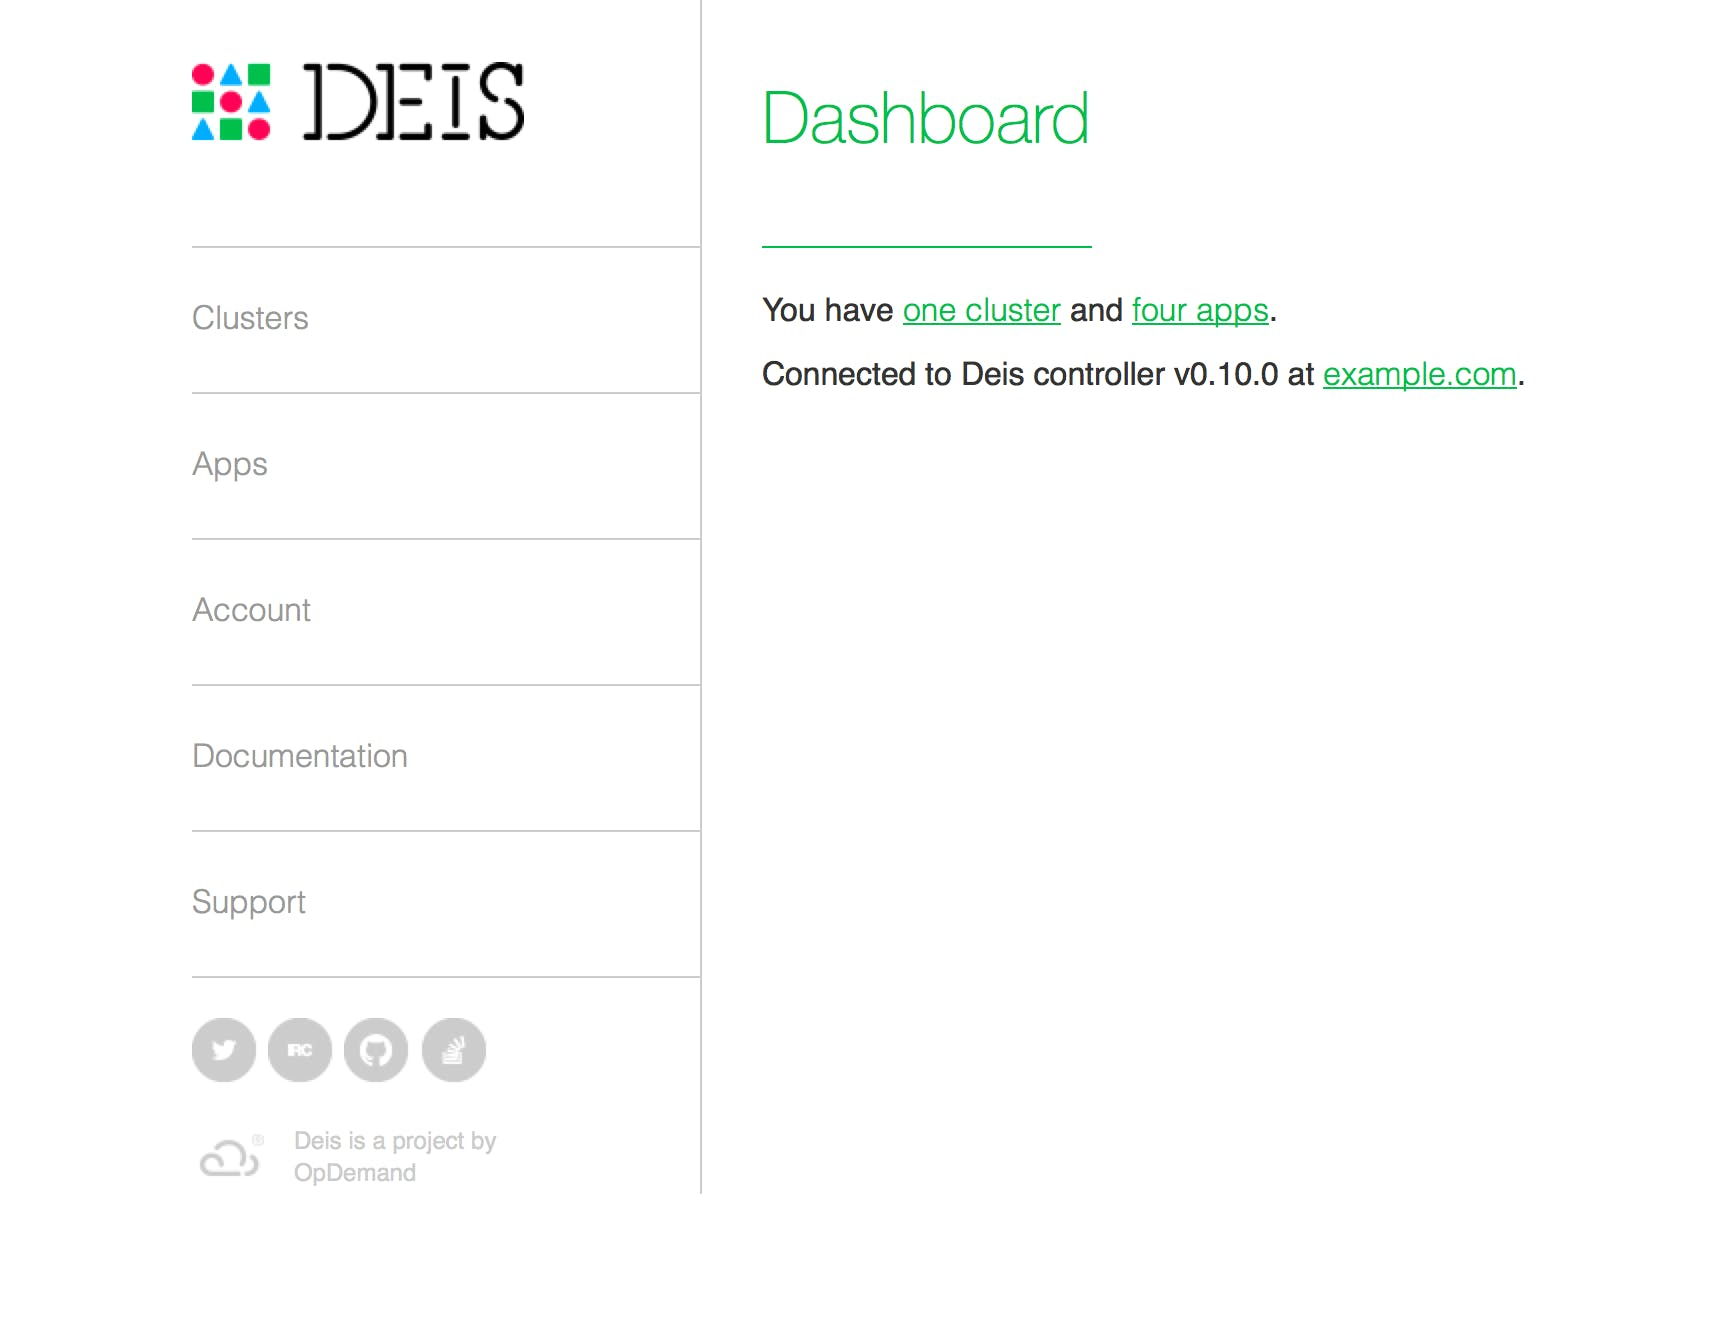 deis-dashboard.png